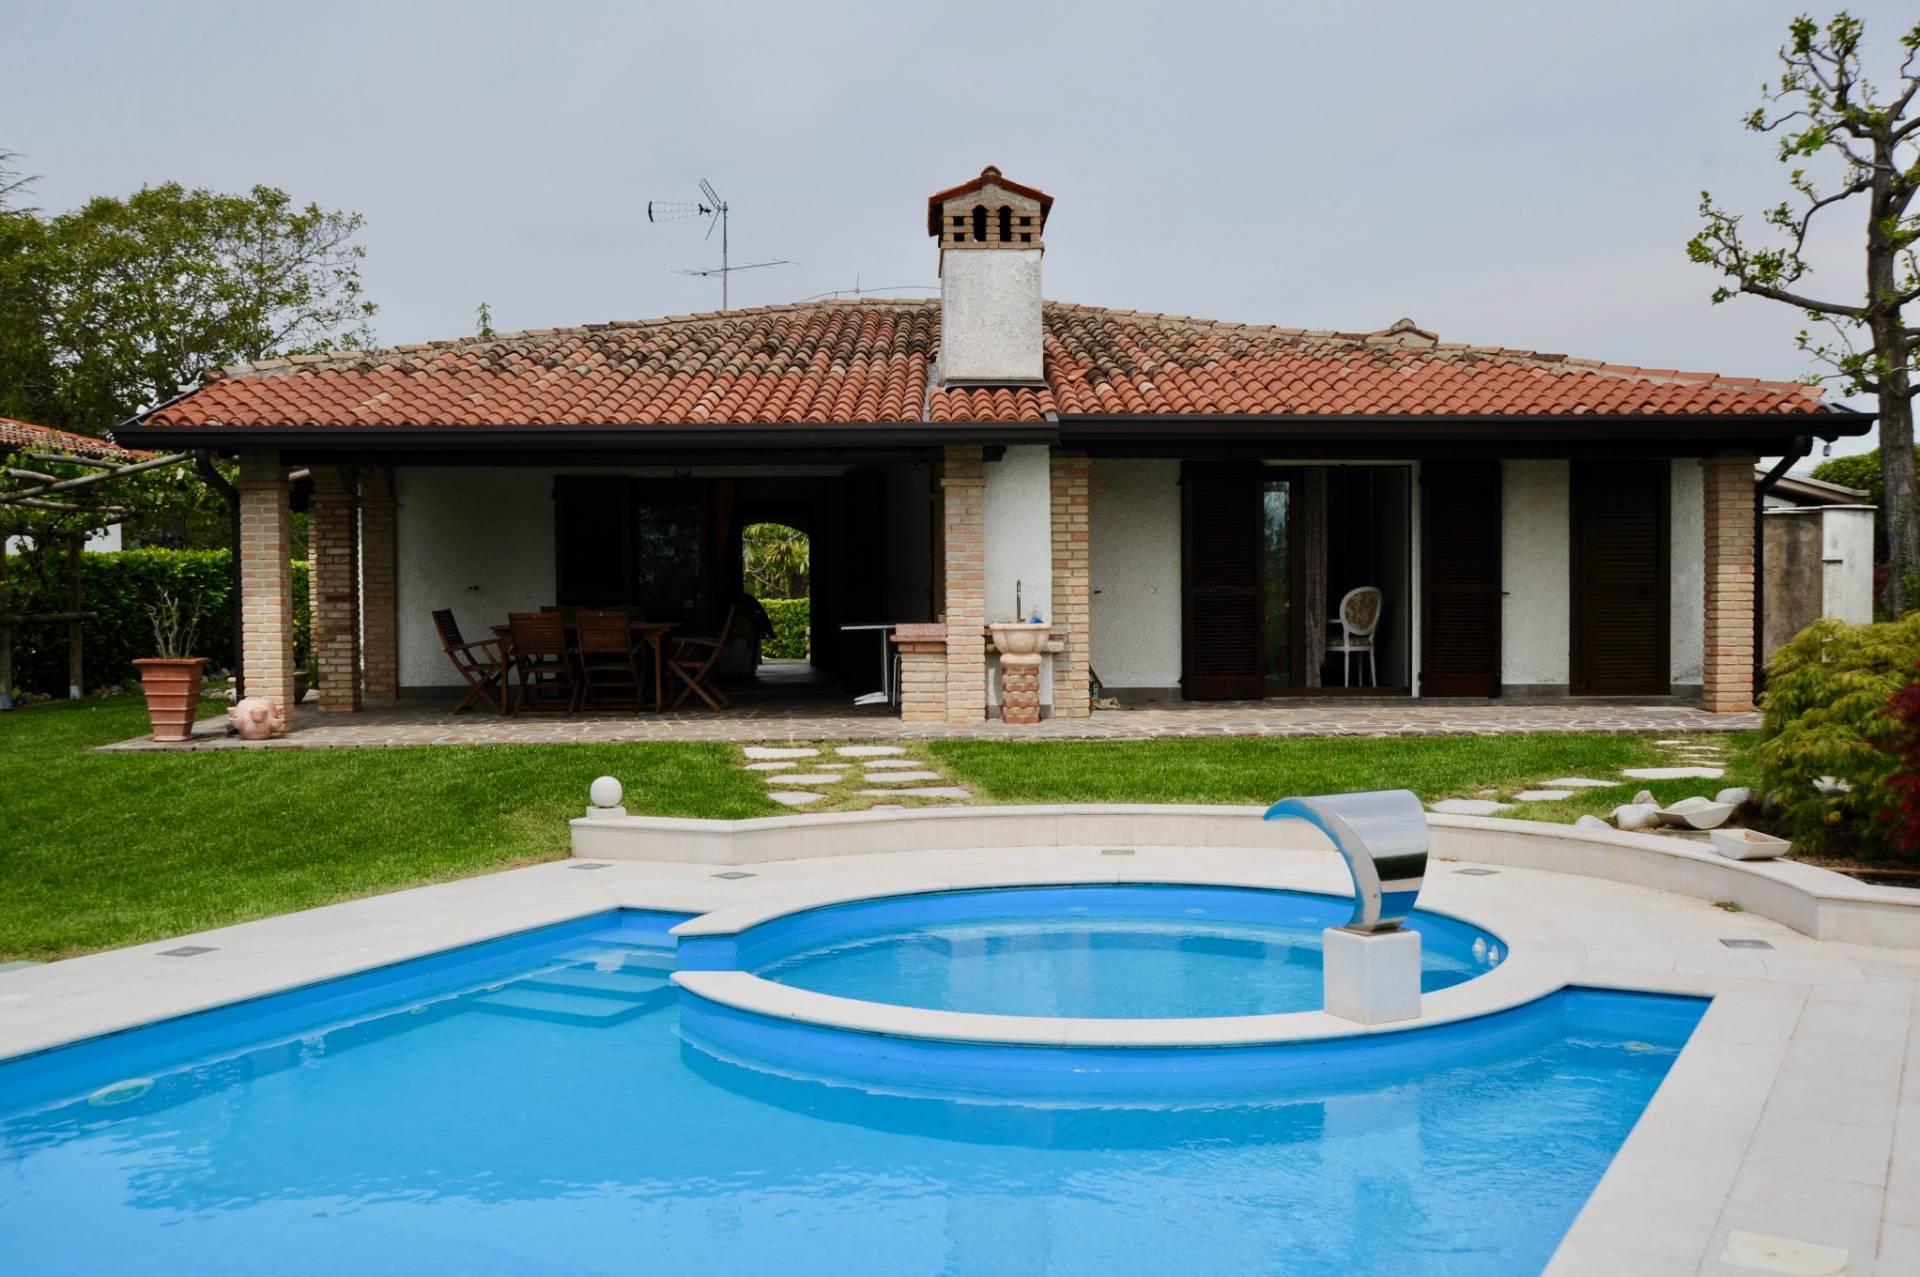 Villa in Vendita a Padenghe Sul Garda: 3 locali, 100 mq - Foto 19